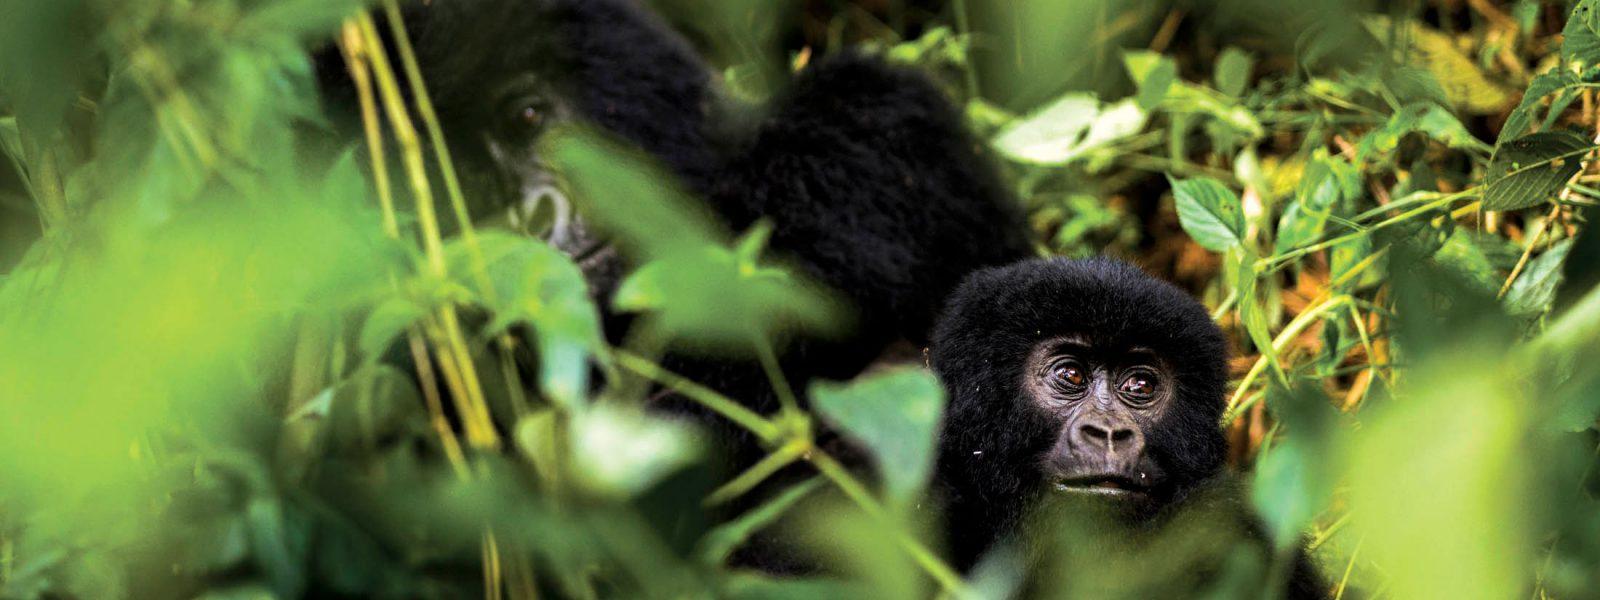 Gorilla Trekking Uganda From Kigali Bwindi Tours Starting Kigali